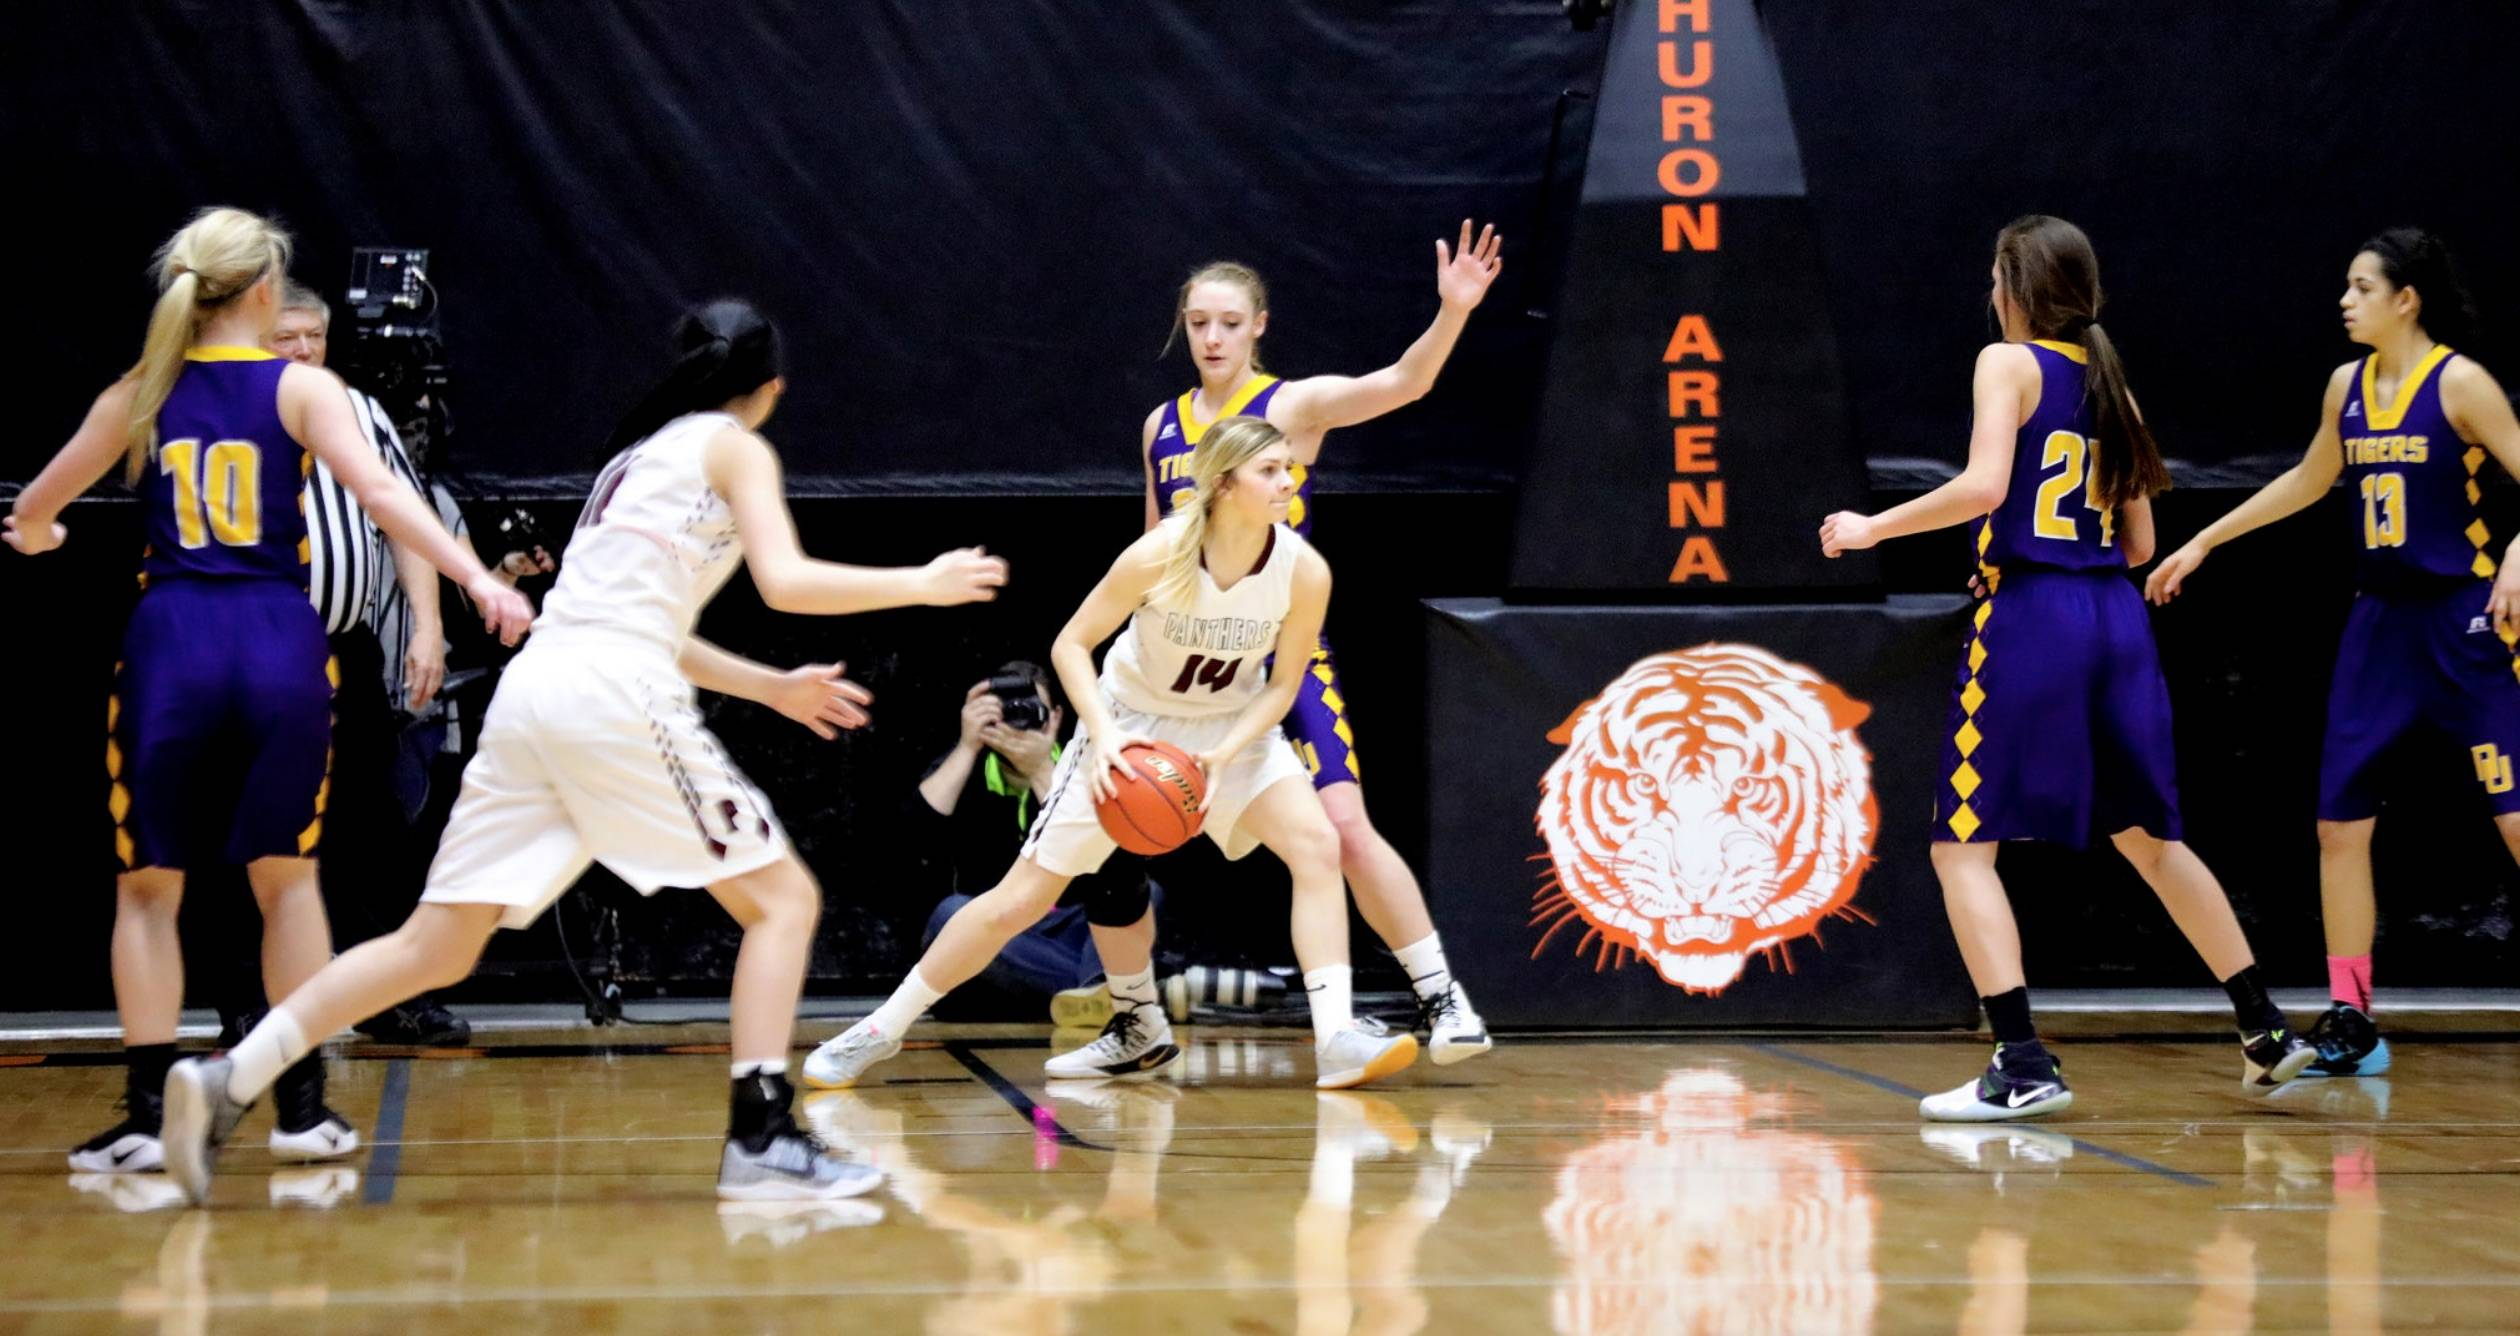 2018 Girls State Basketball Tournament Brackets